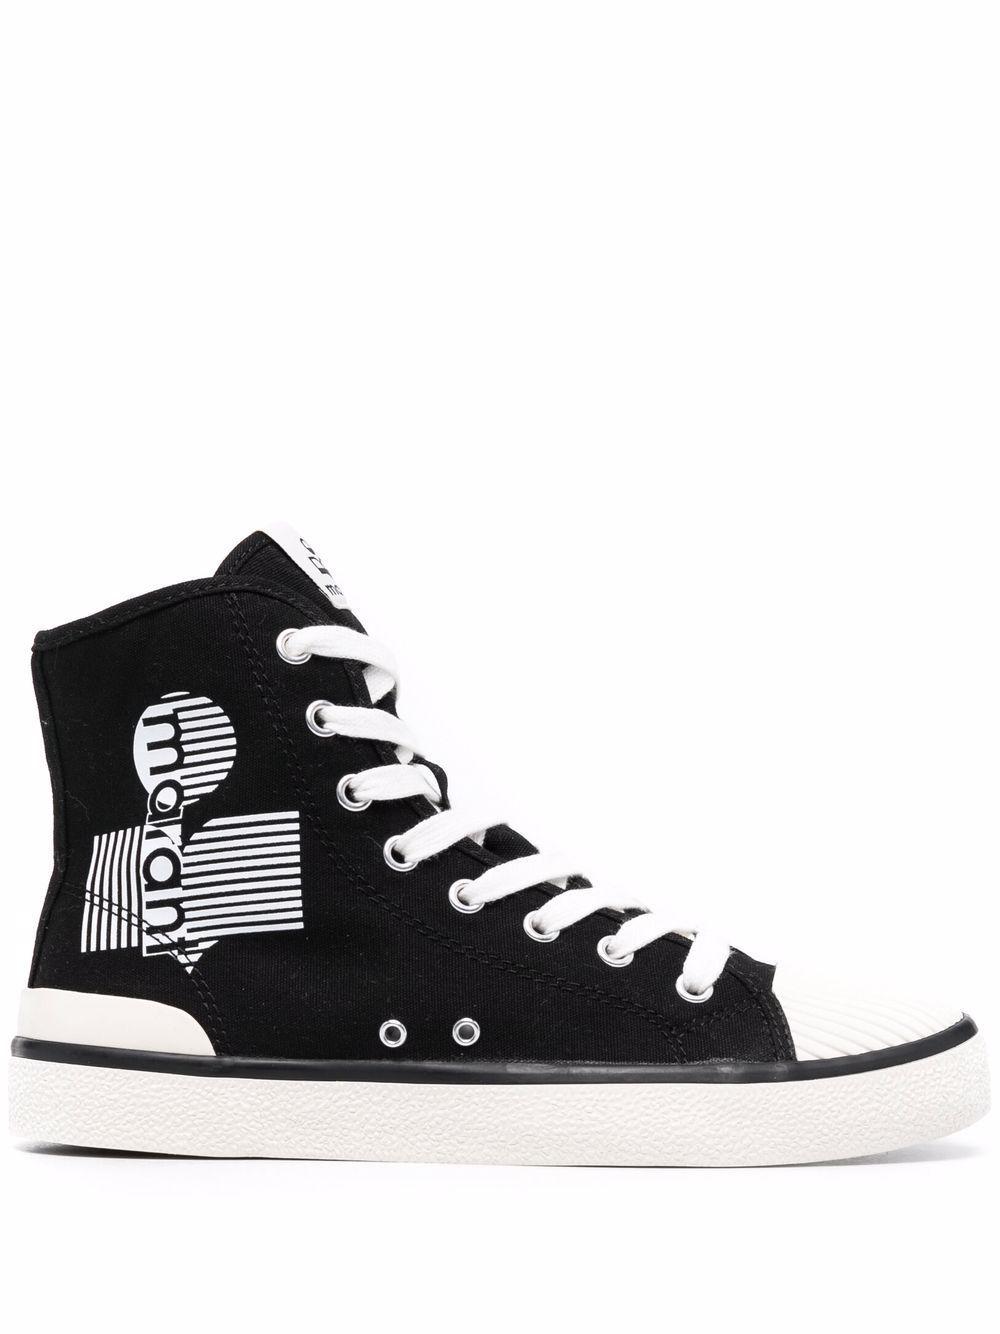 Sneaker benkeen con logo